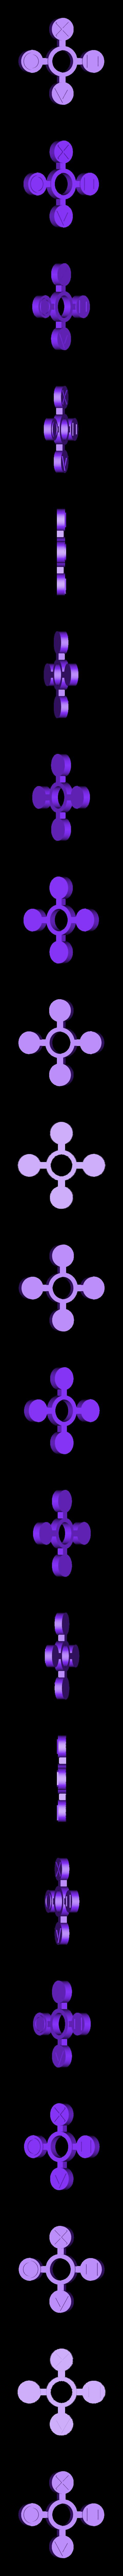 playspinn.stl Télécharger fichier STL gratuit Playstation Handspinner • Modèle imprimable en 3D, Erikum